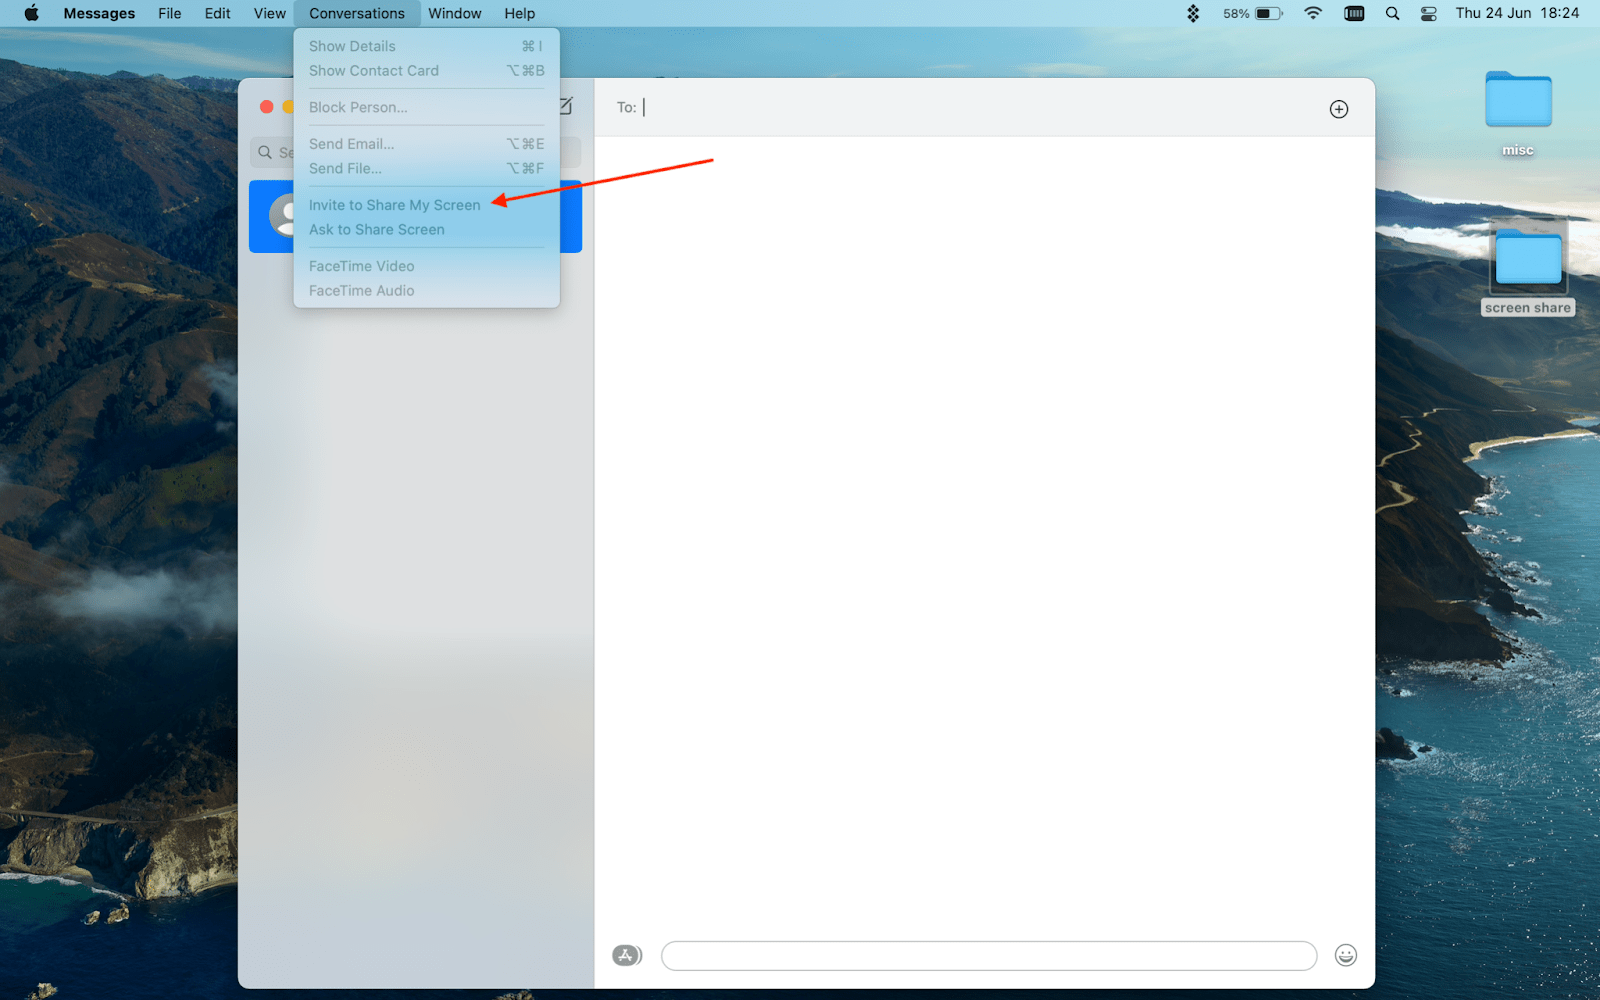 screenshare on a Mac using iMessage